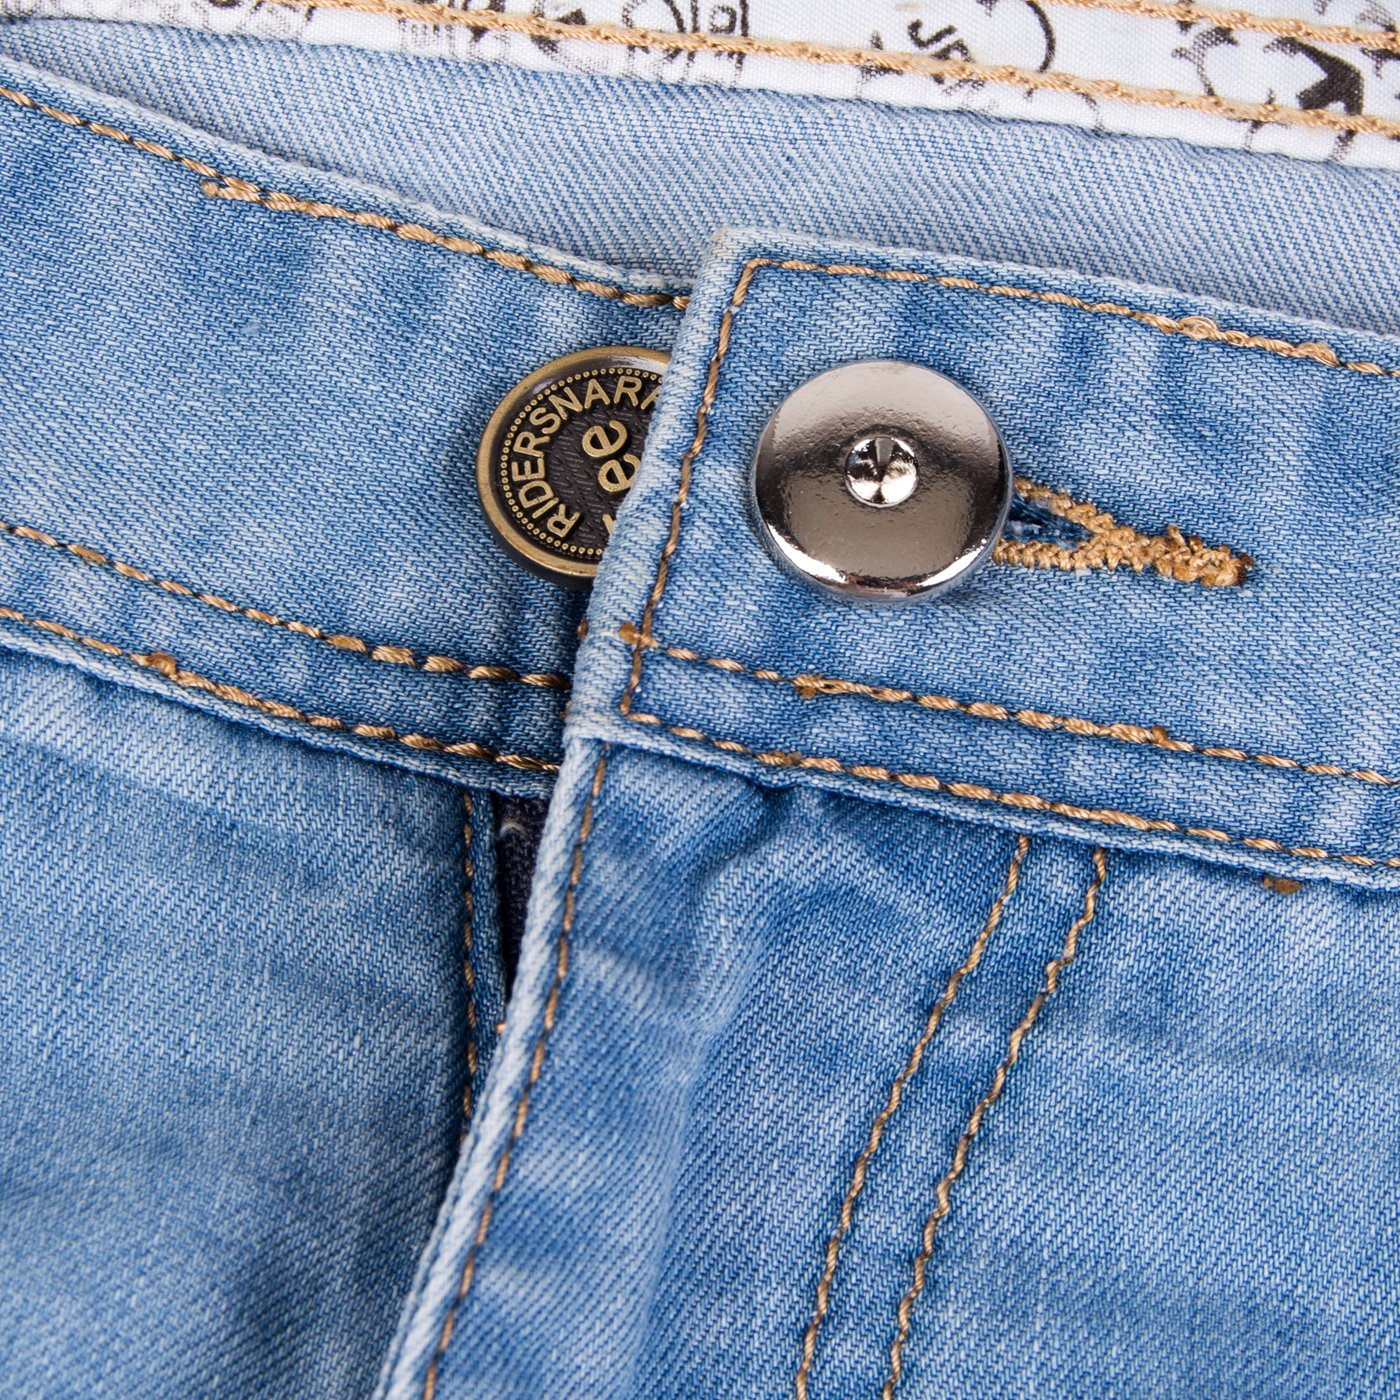 Vancool 10pcs Metal botón extensores para jeans (19mm/0.74